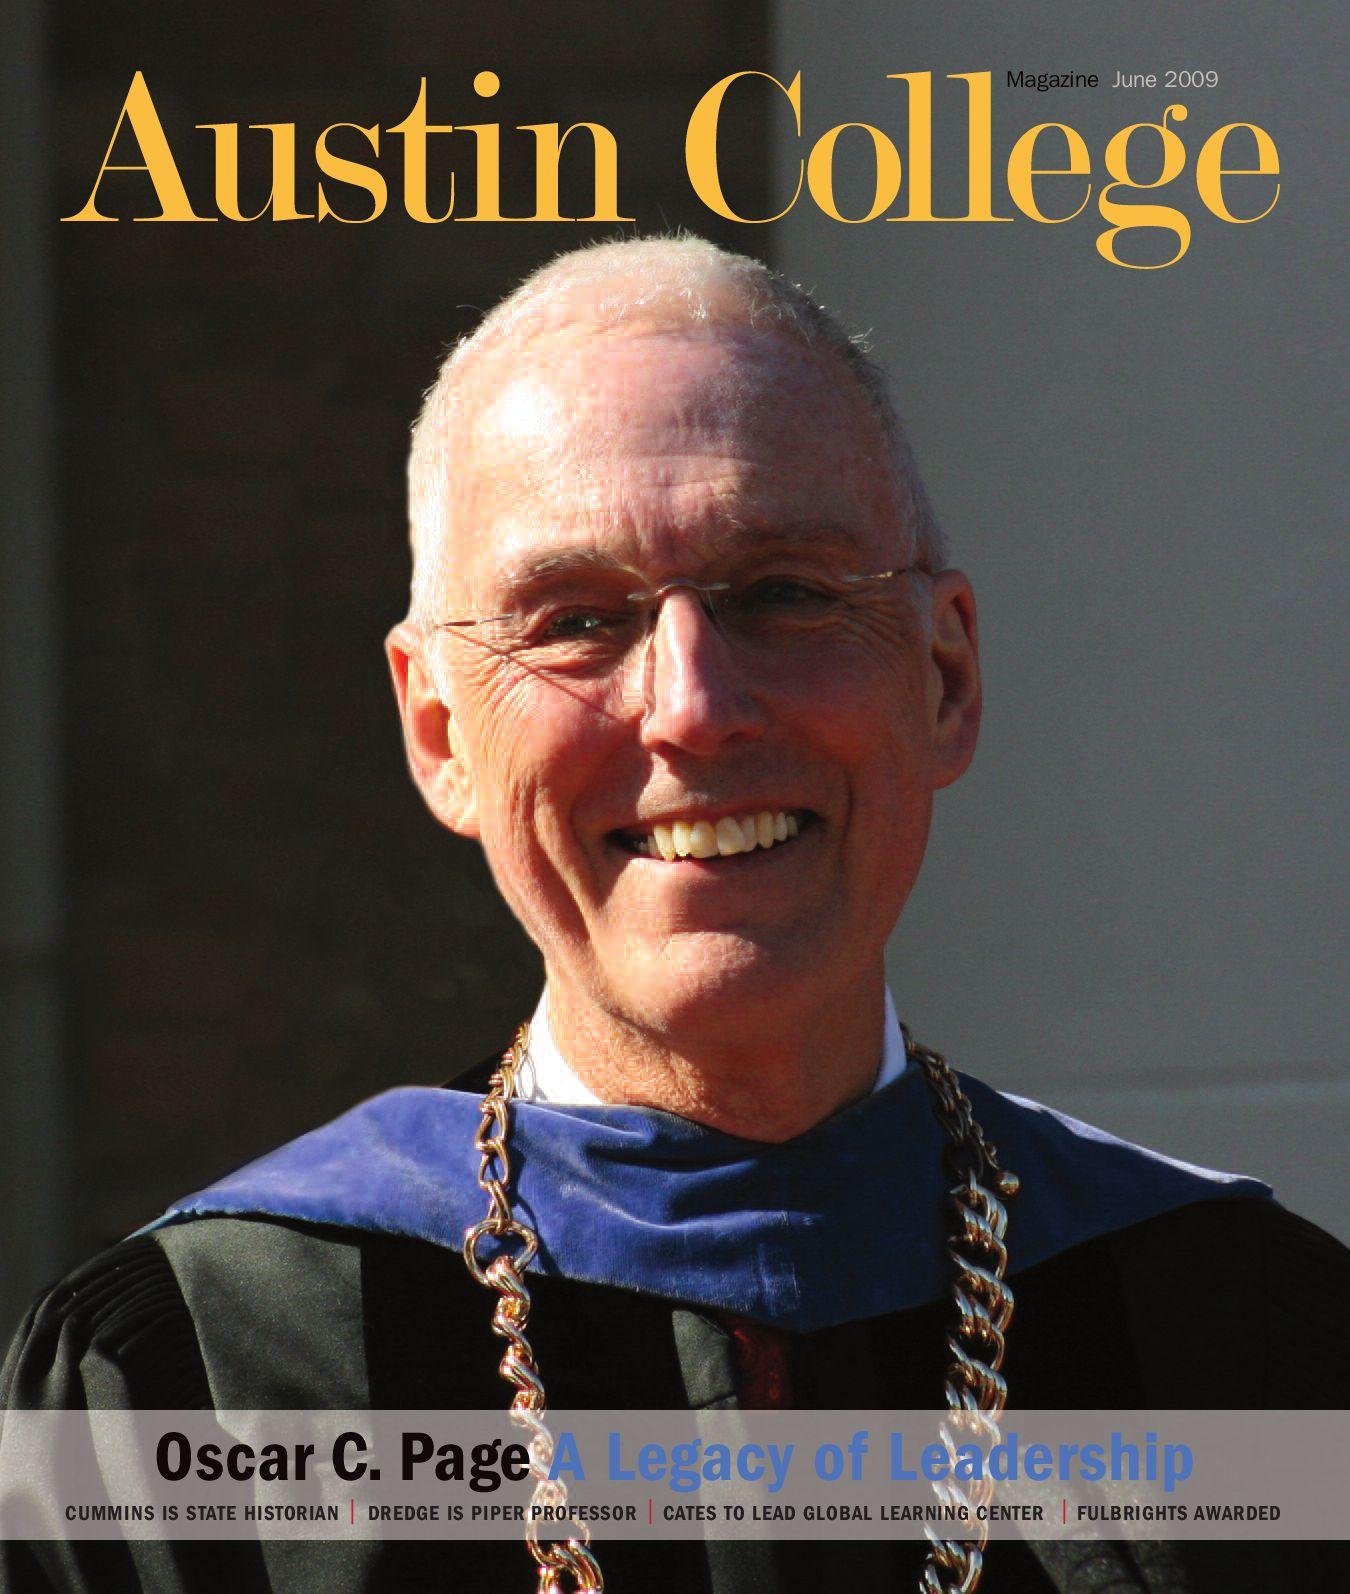 Austin college magazine june 2009 by austin college issuu publicscrutiny Gallery